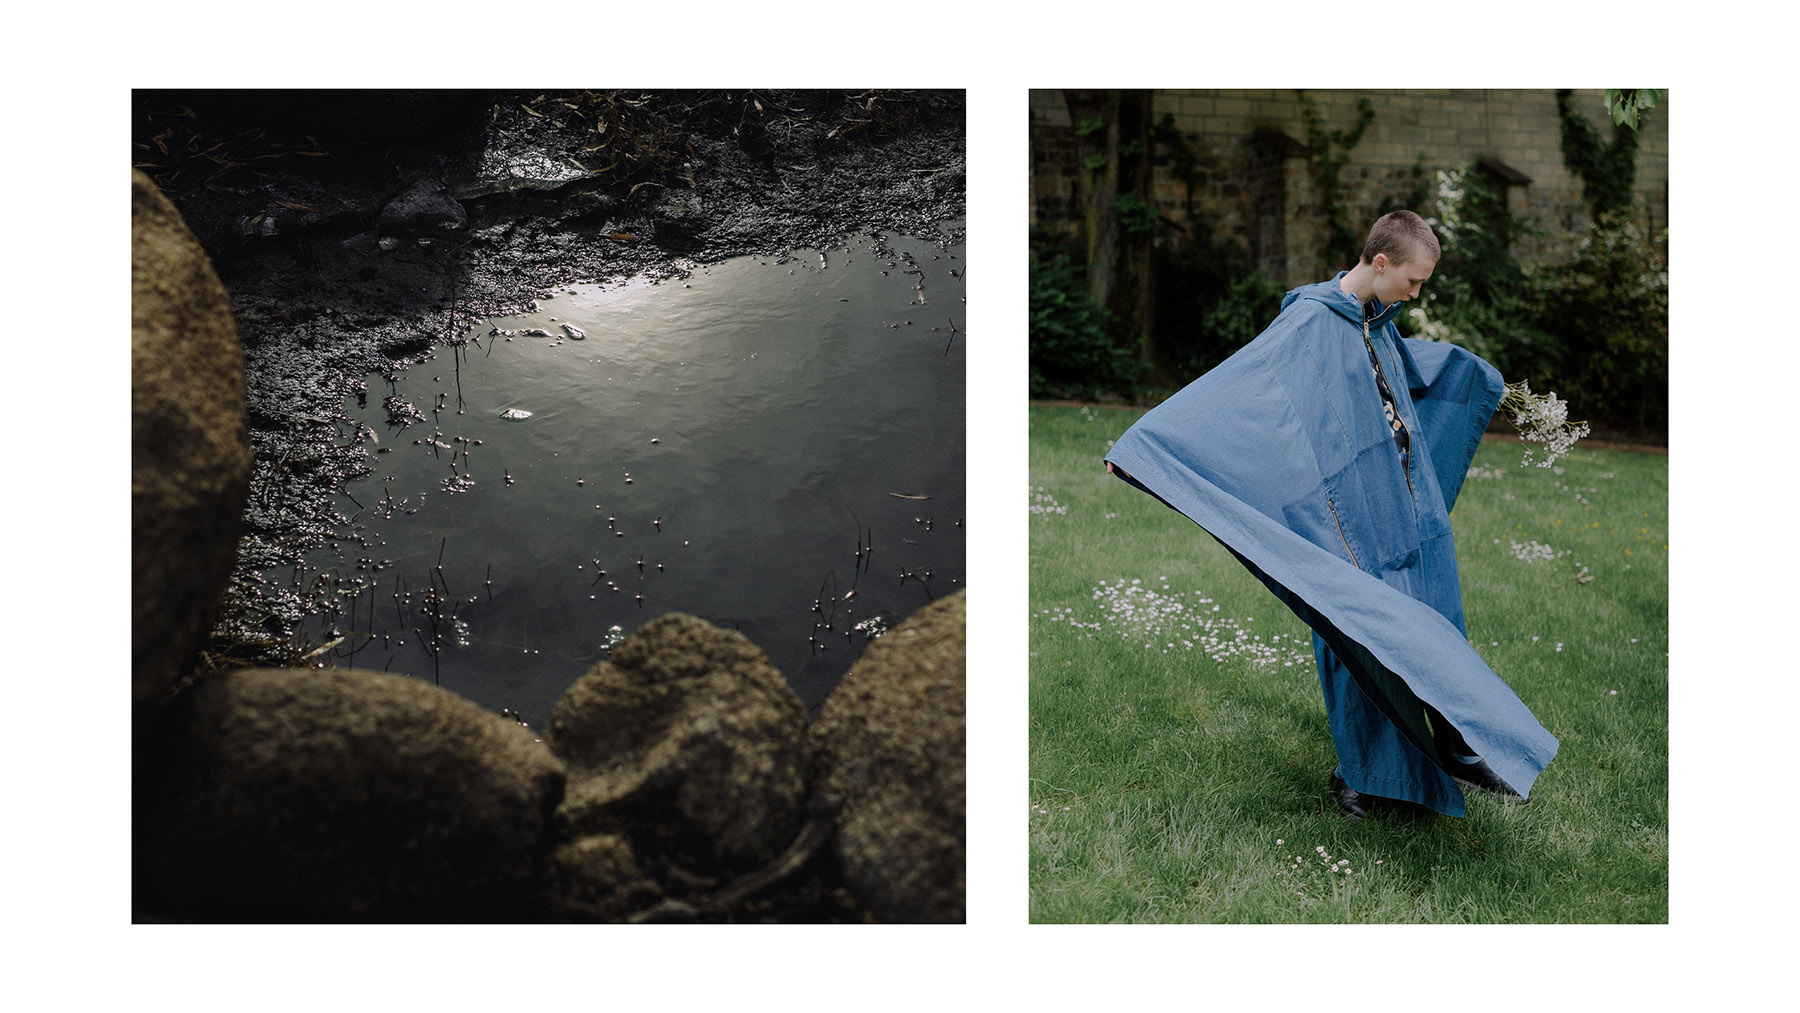 iGNANT-Photography-John-Clayton-Lee-Selection-010